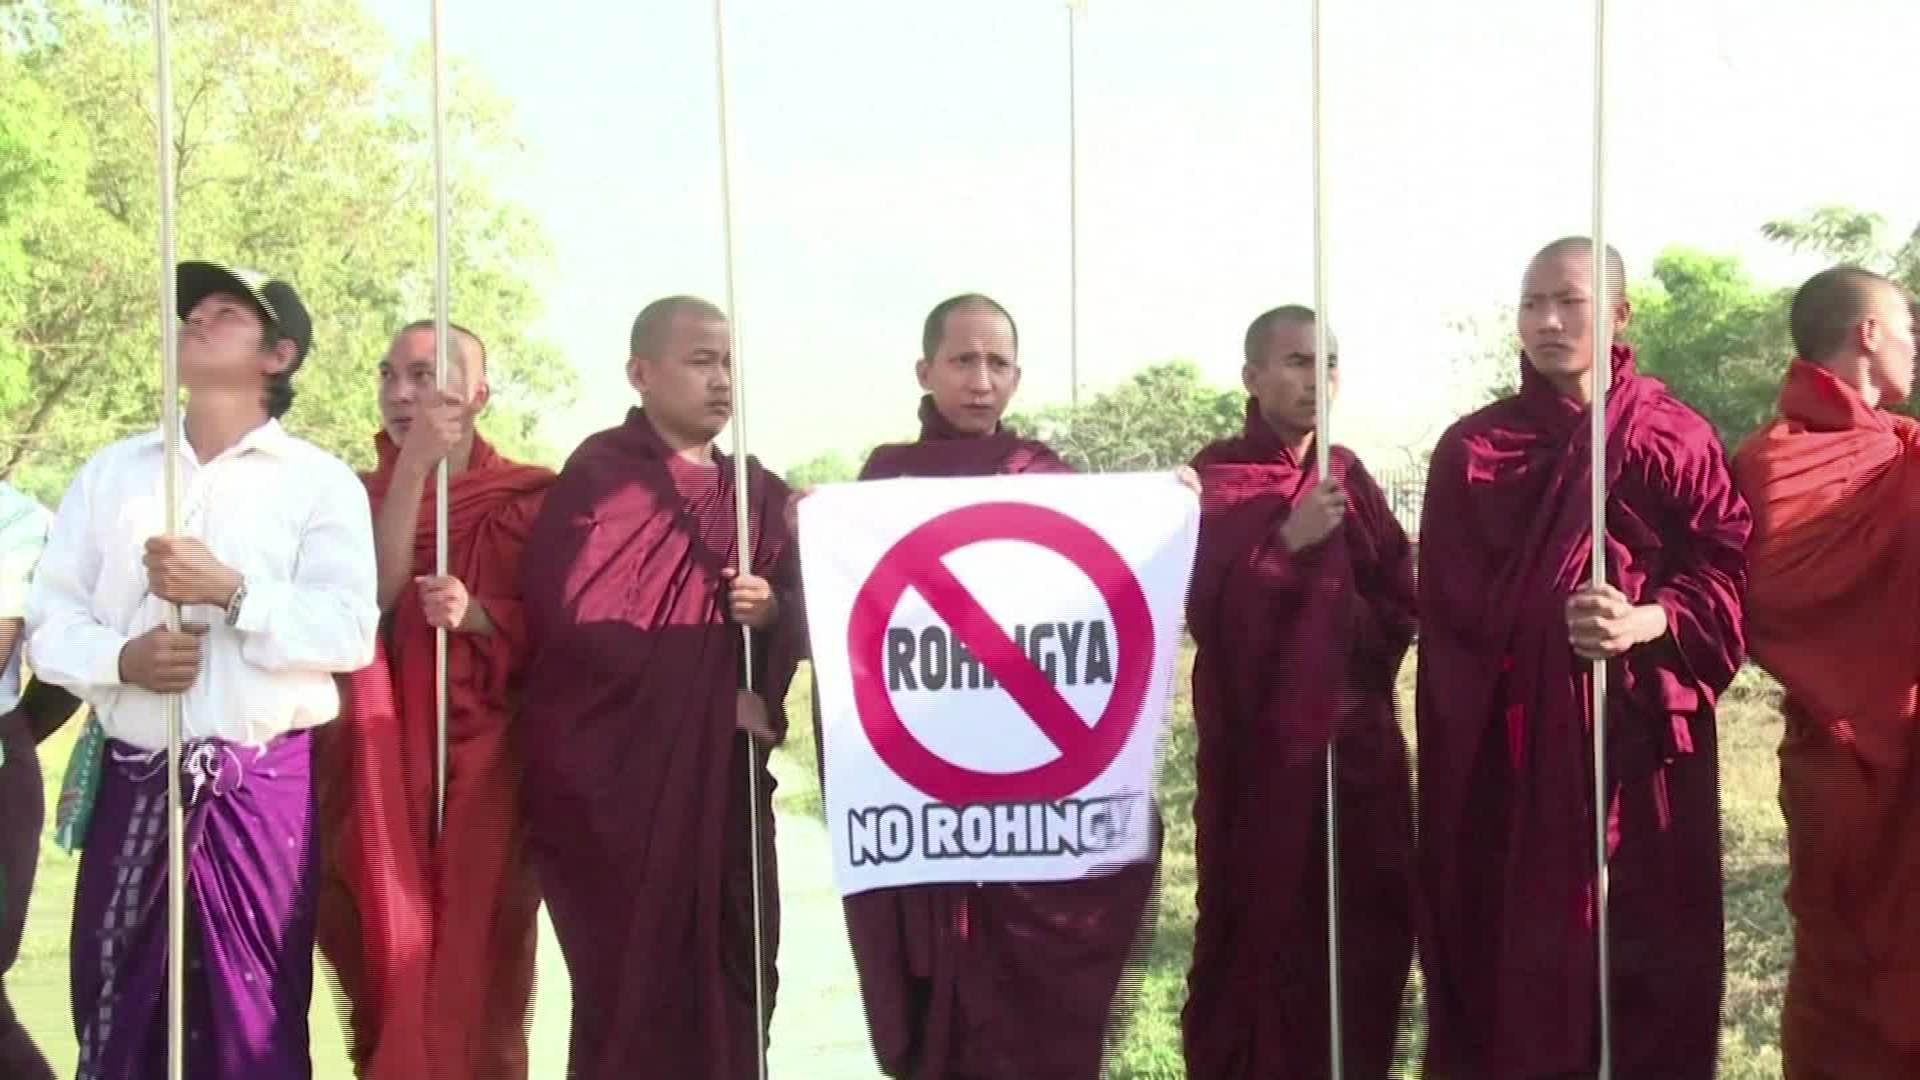 Report: Myanmar military raping Rohingya women - CNN Video